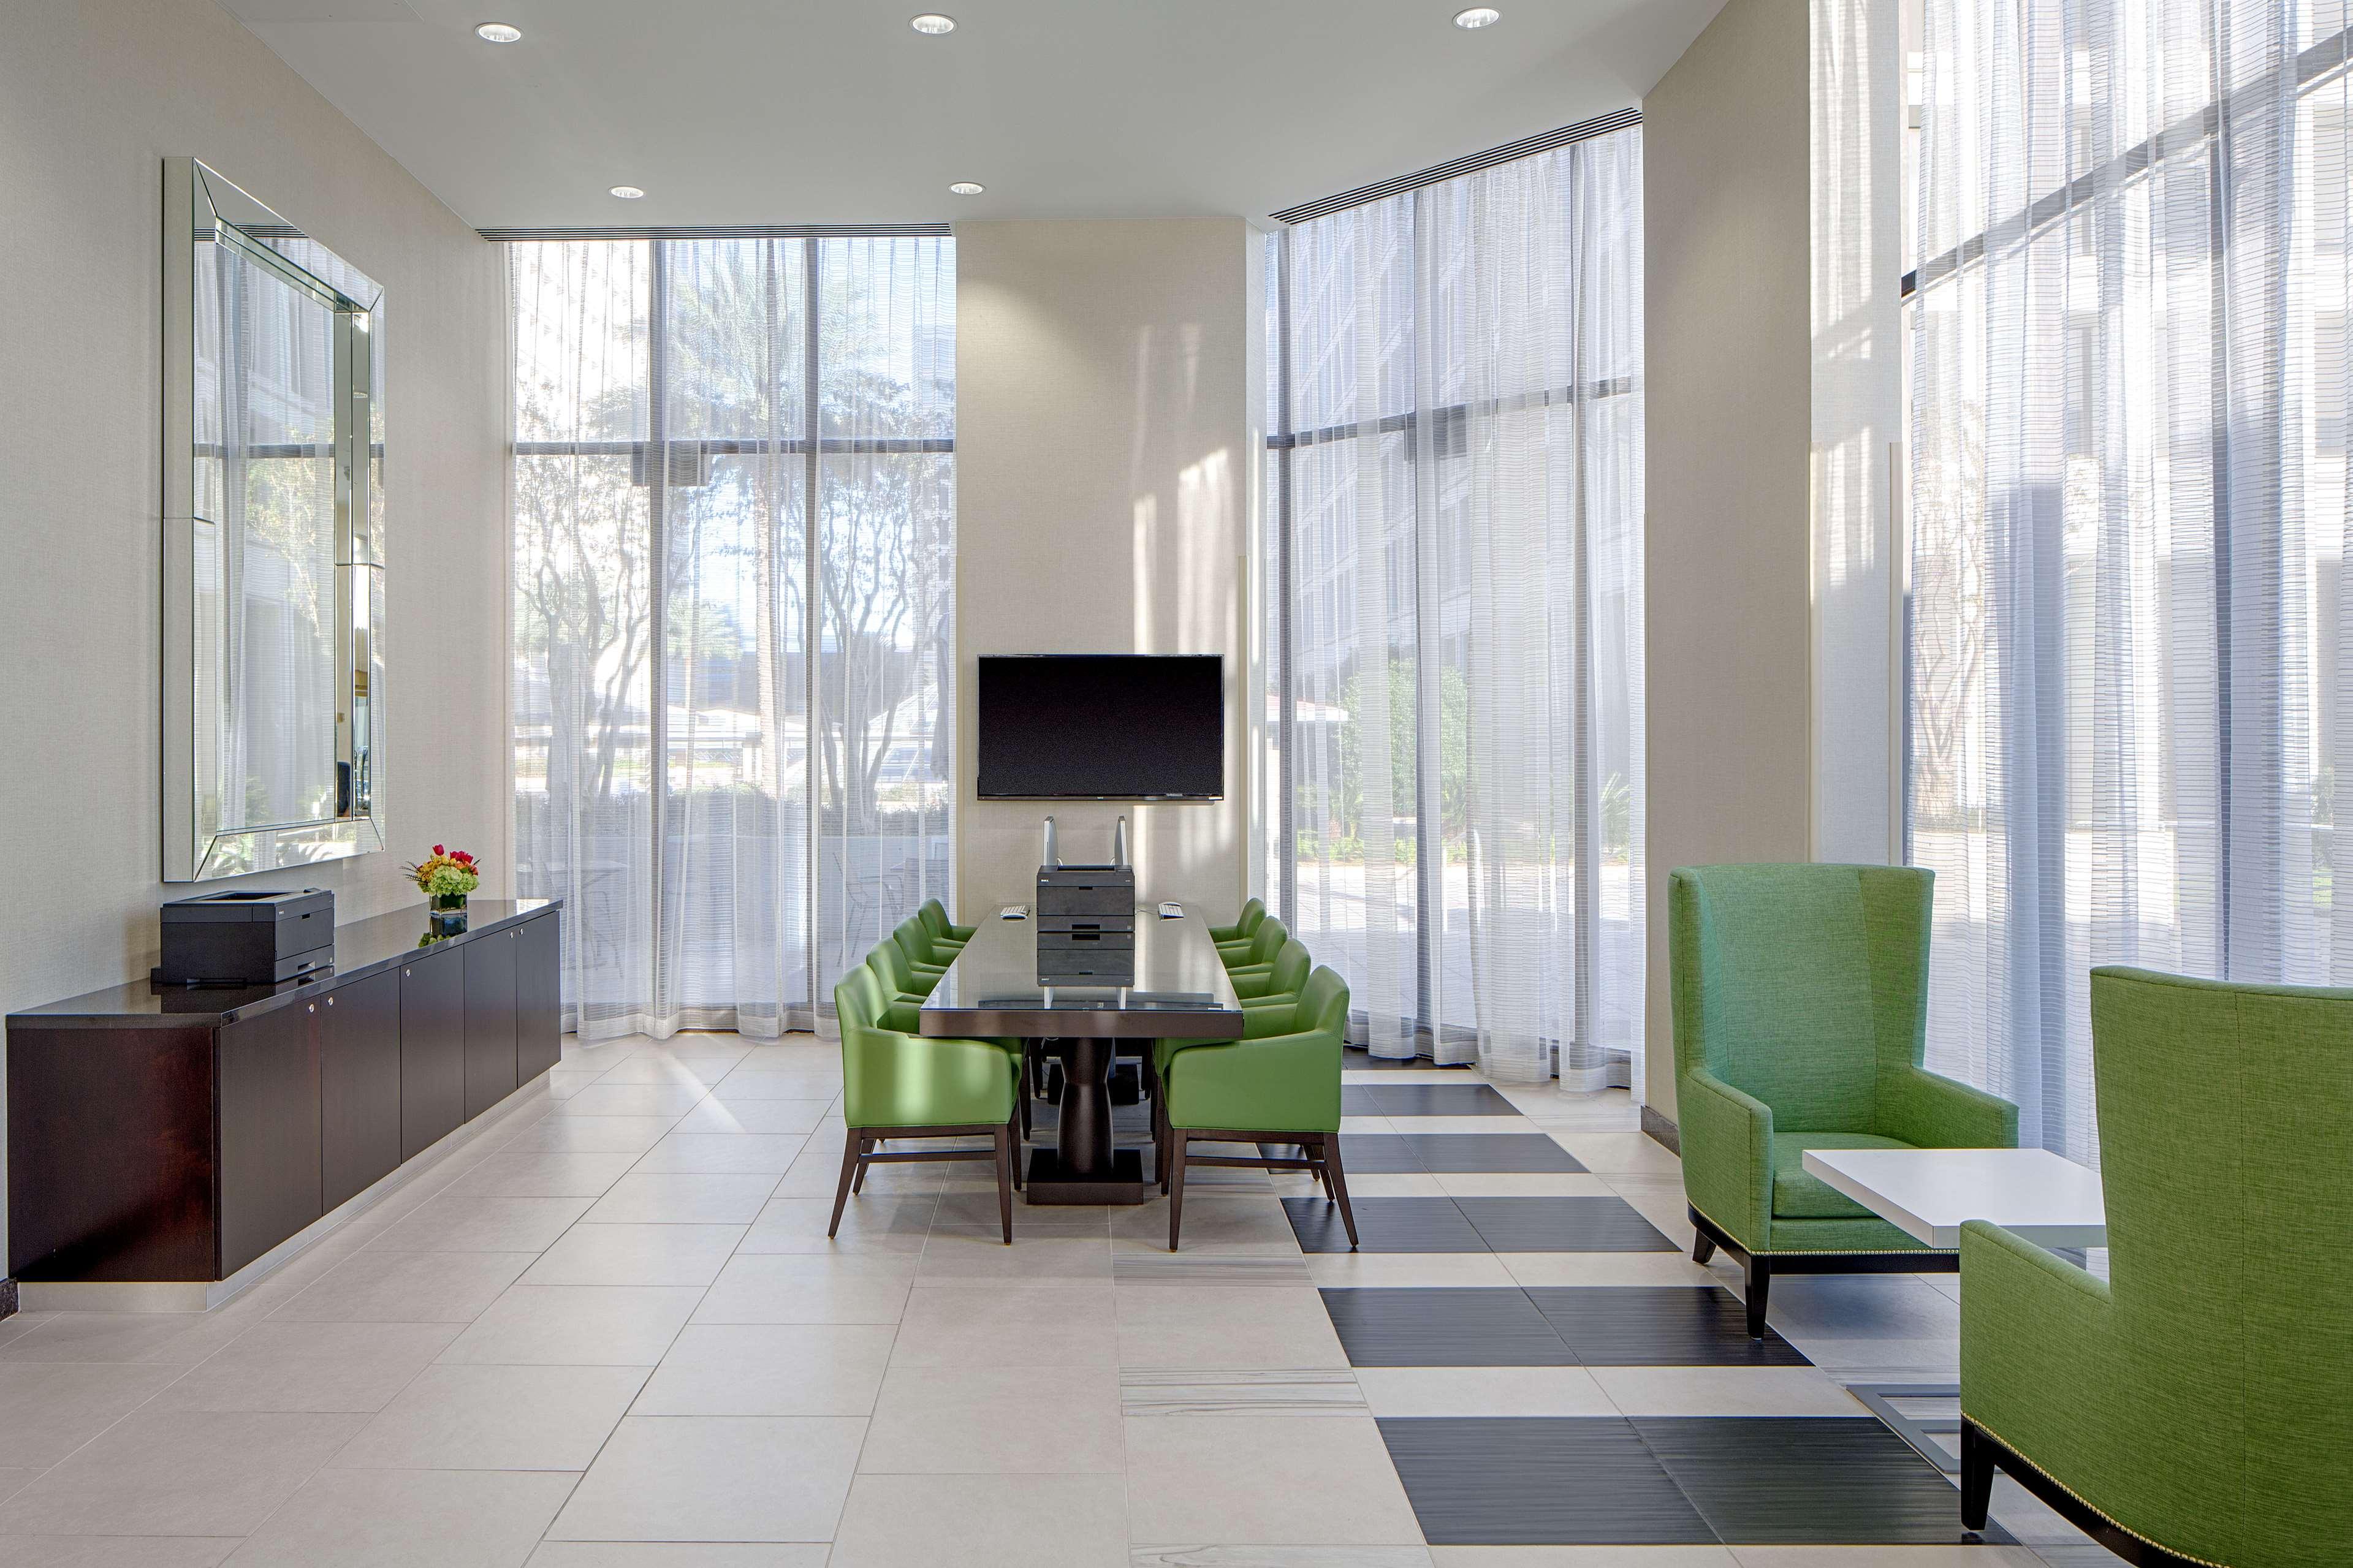 DoubleTree by Hilton Hotel Houston - Greenway Plaza image 44